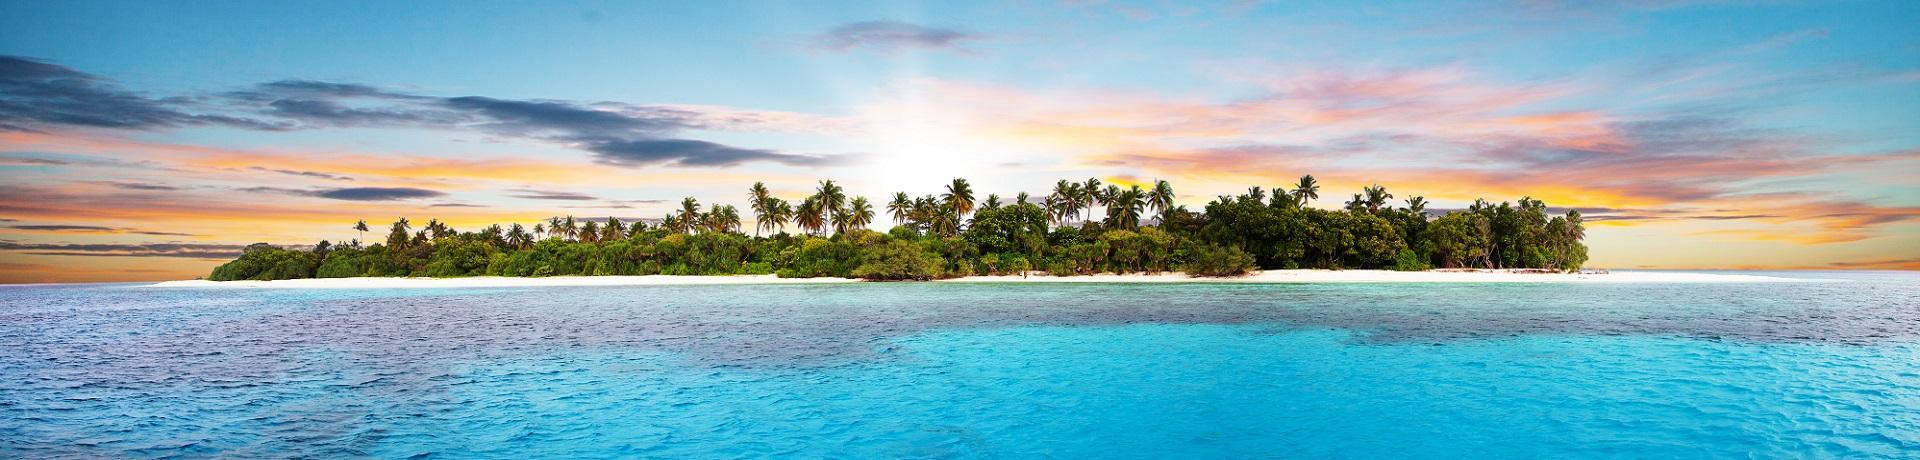 Malediven: Insel - Emotion